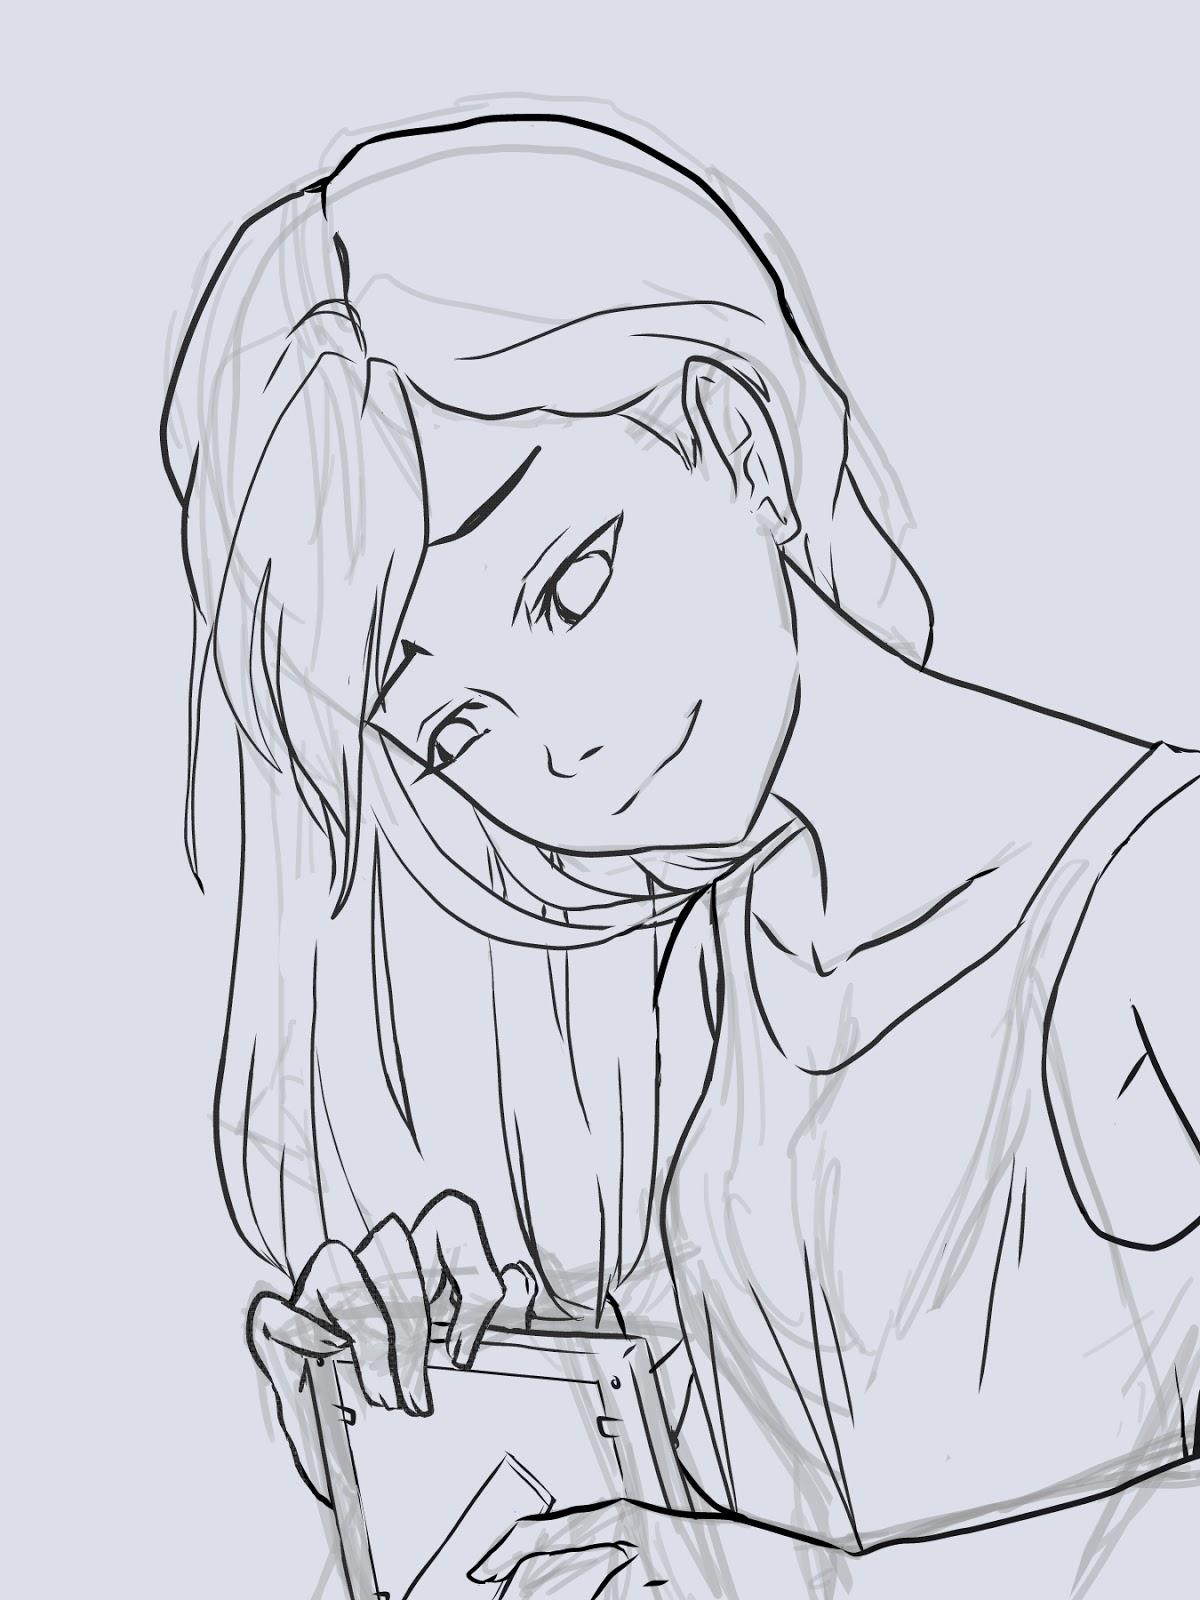 Manga Interest Sad Anime Girl Process On Manga Studios